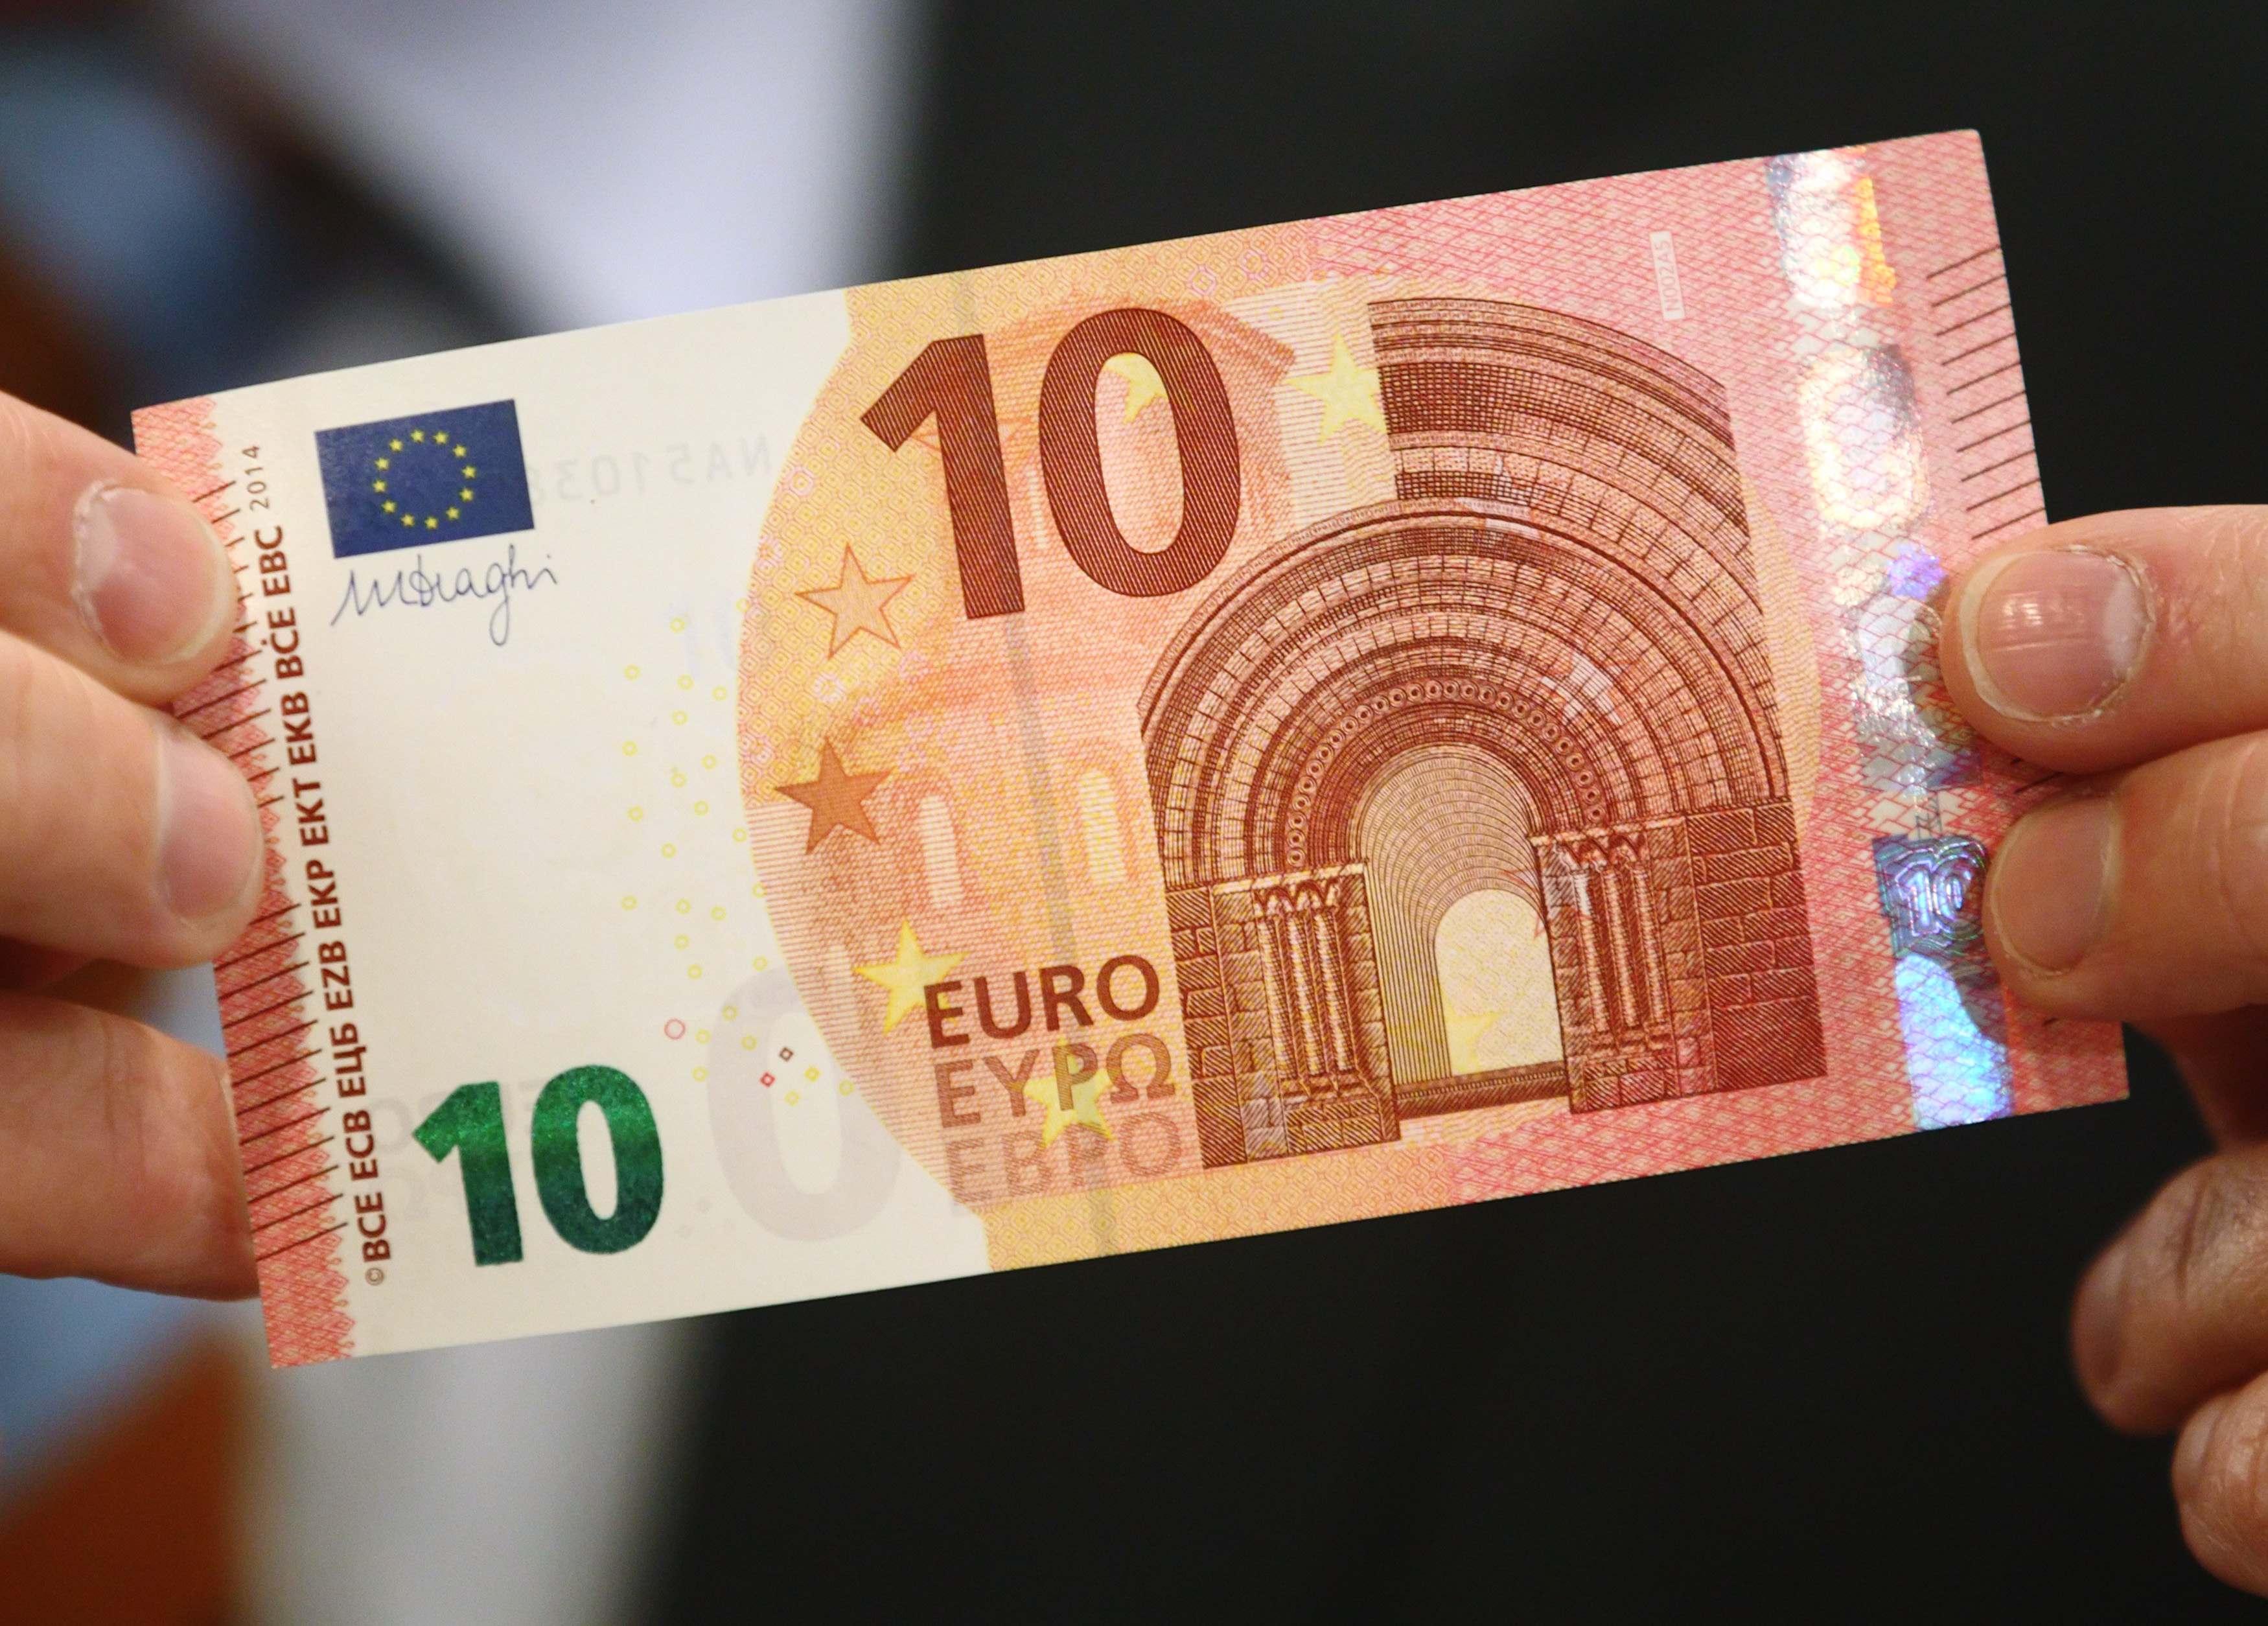 Нацбанк на 21 копейку снизил курс евро